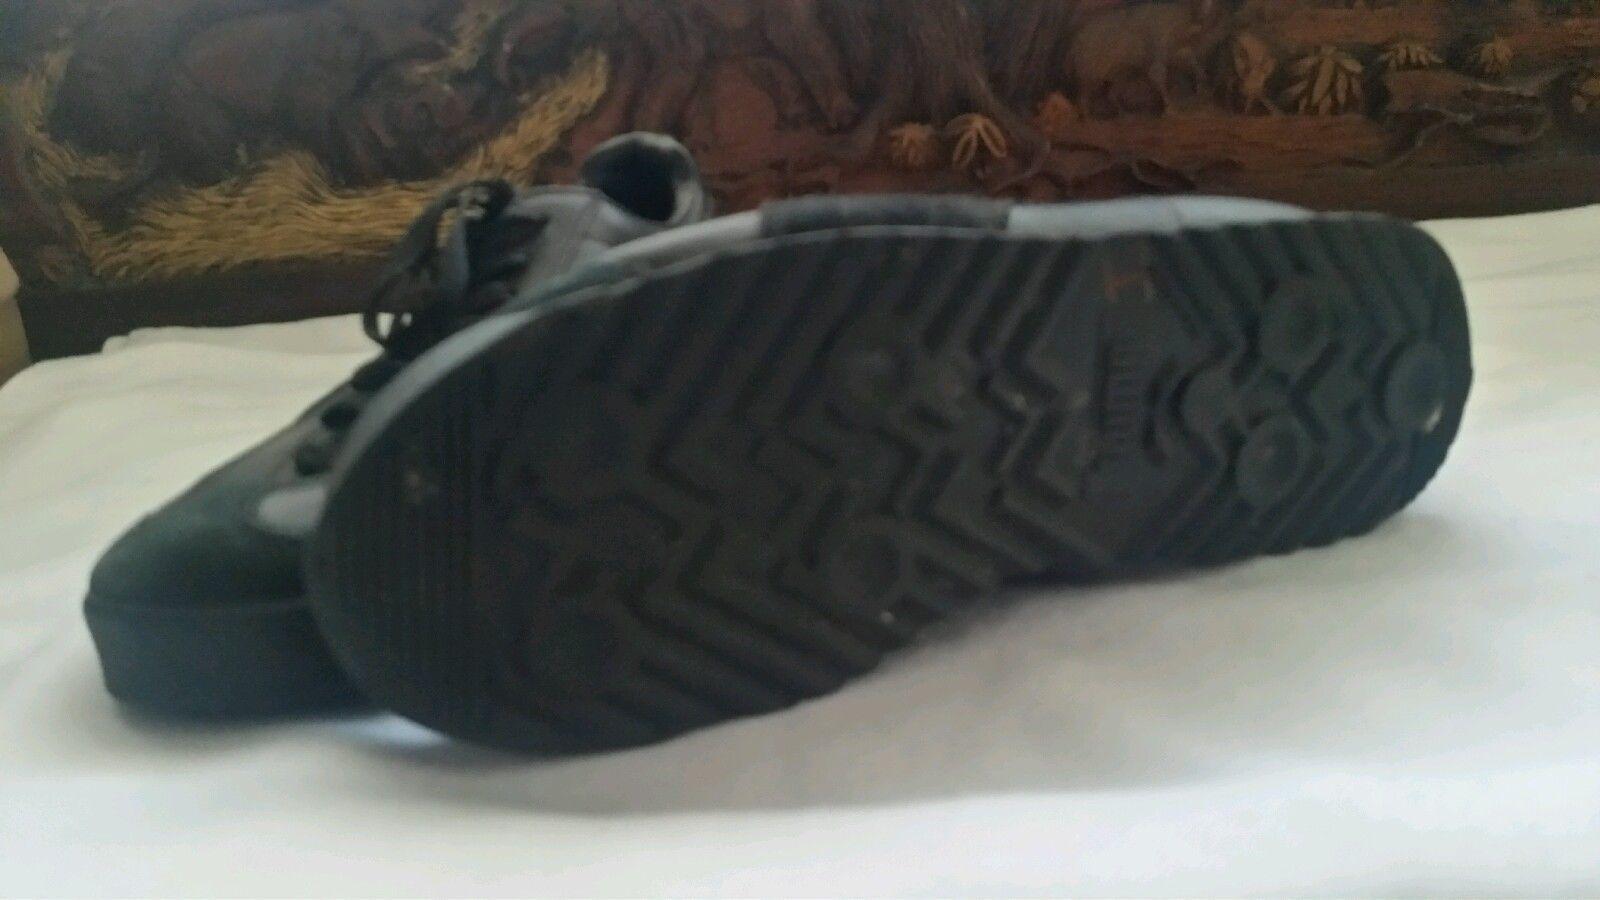 ... Puma Roma Basic Women s Black leather sneakers Sz 5 US   37 EUR- EUC a998bea73